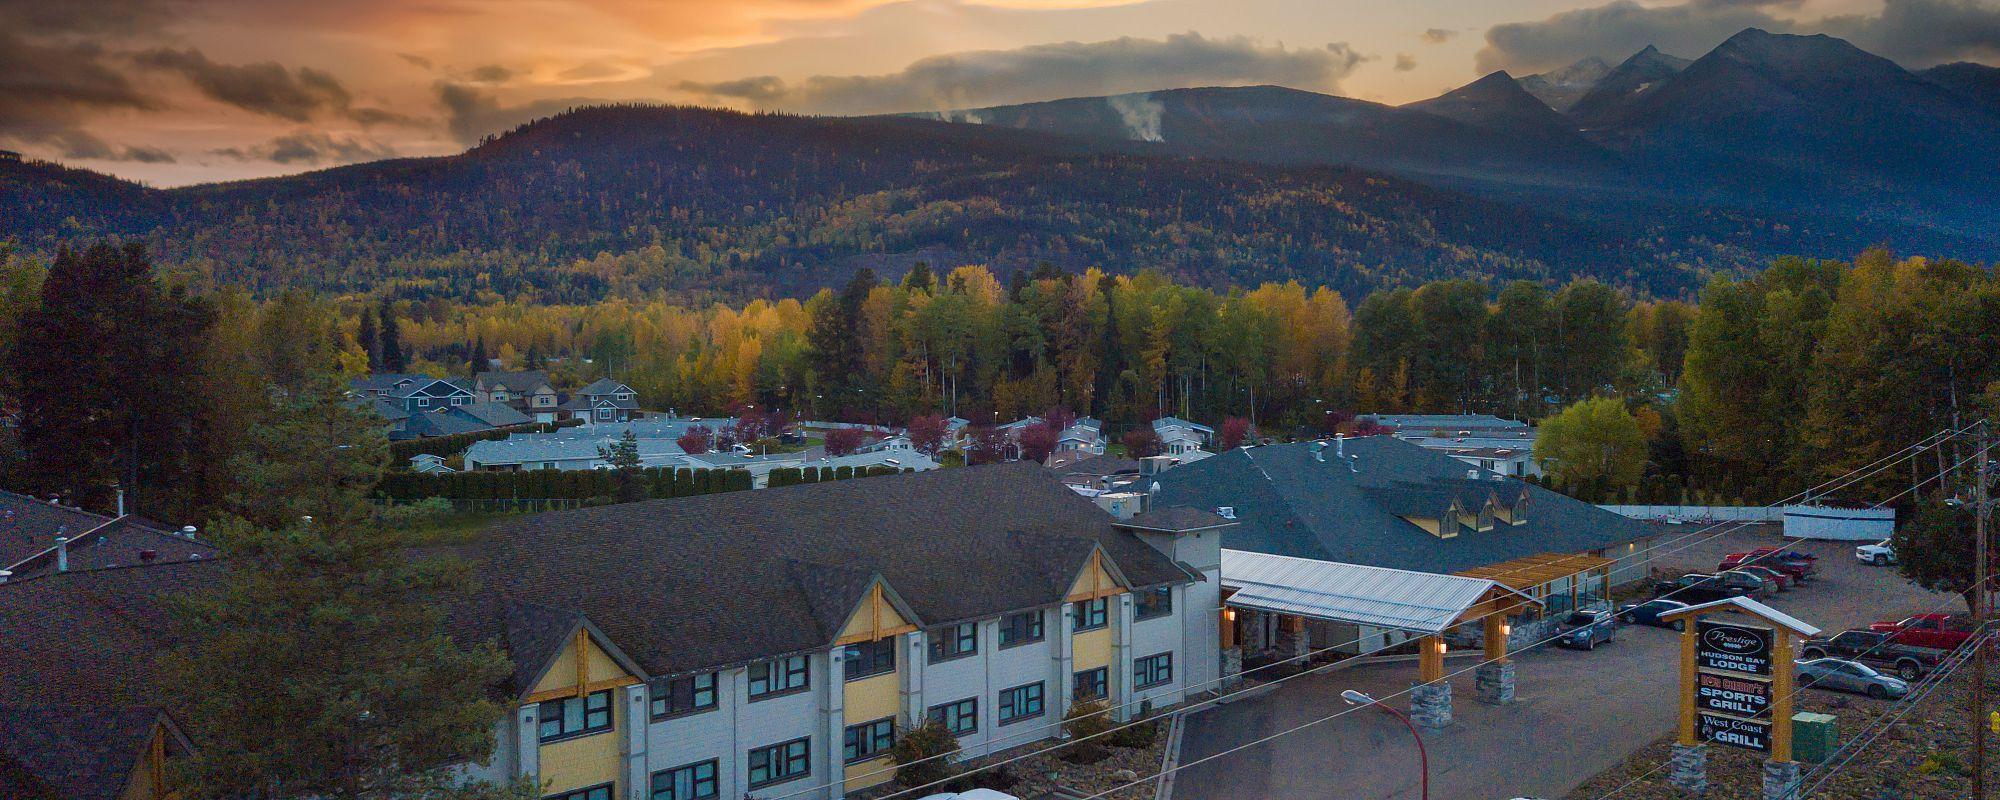 Prestige Hudson Bay exterior drone shot cropped for web